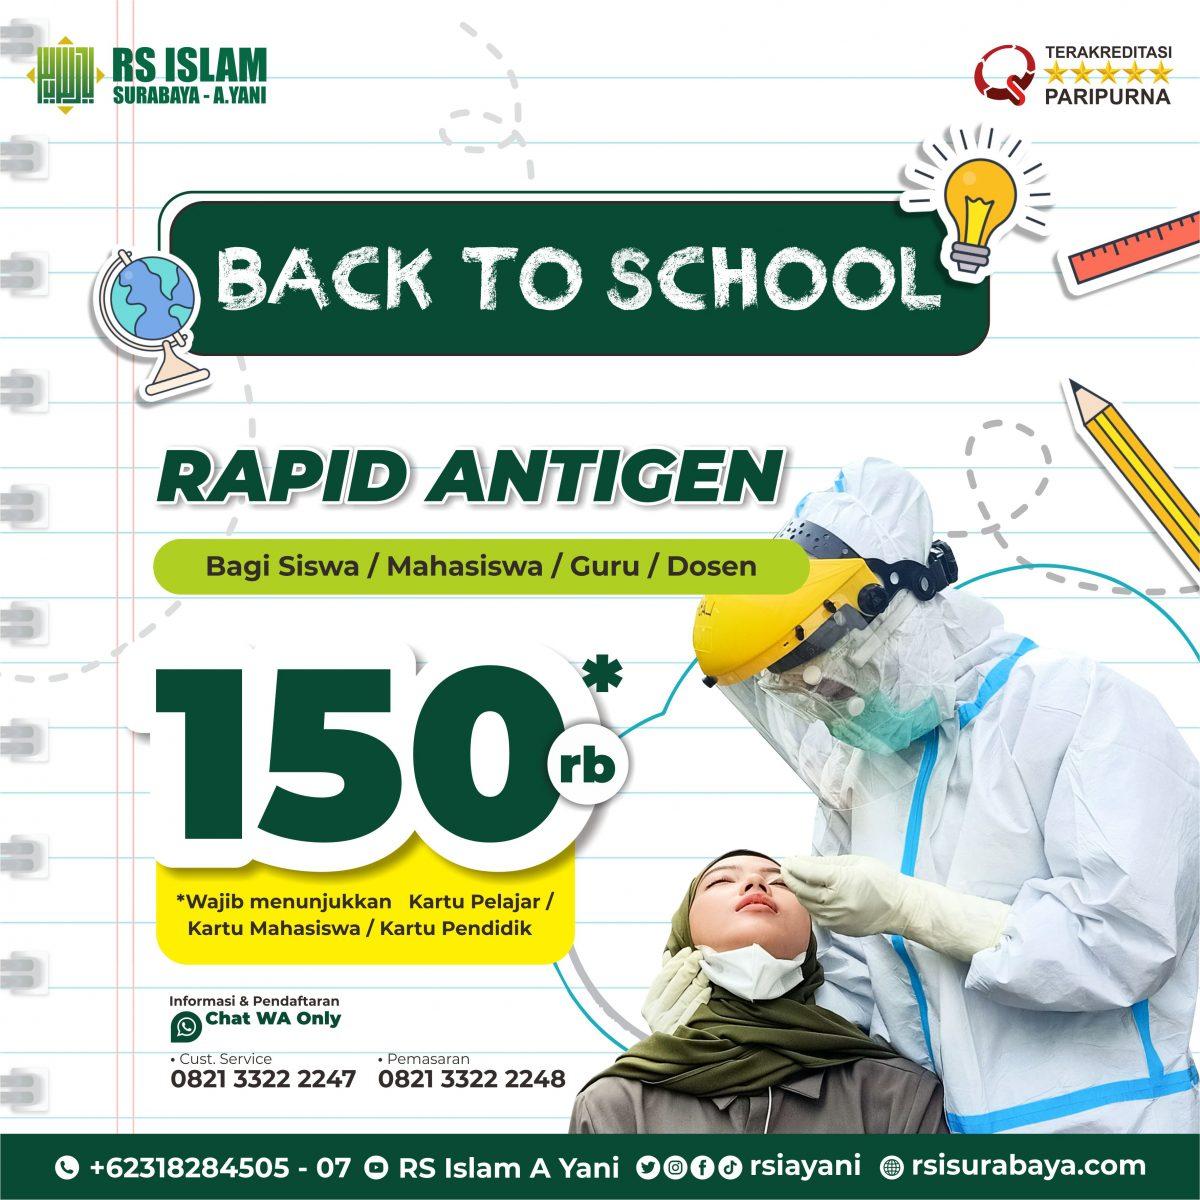 1-Back-to-school-1200x1200.jpg